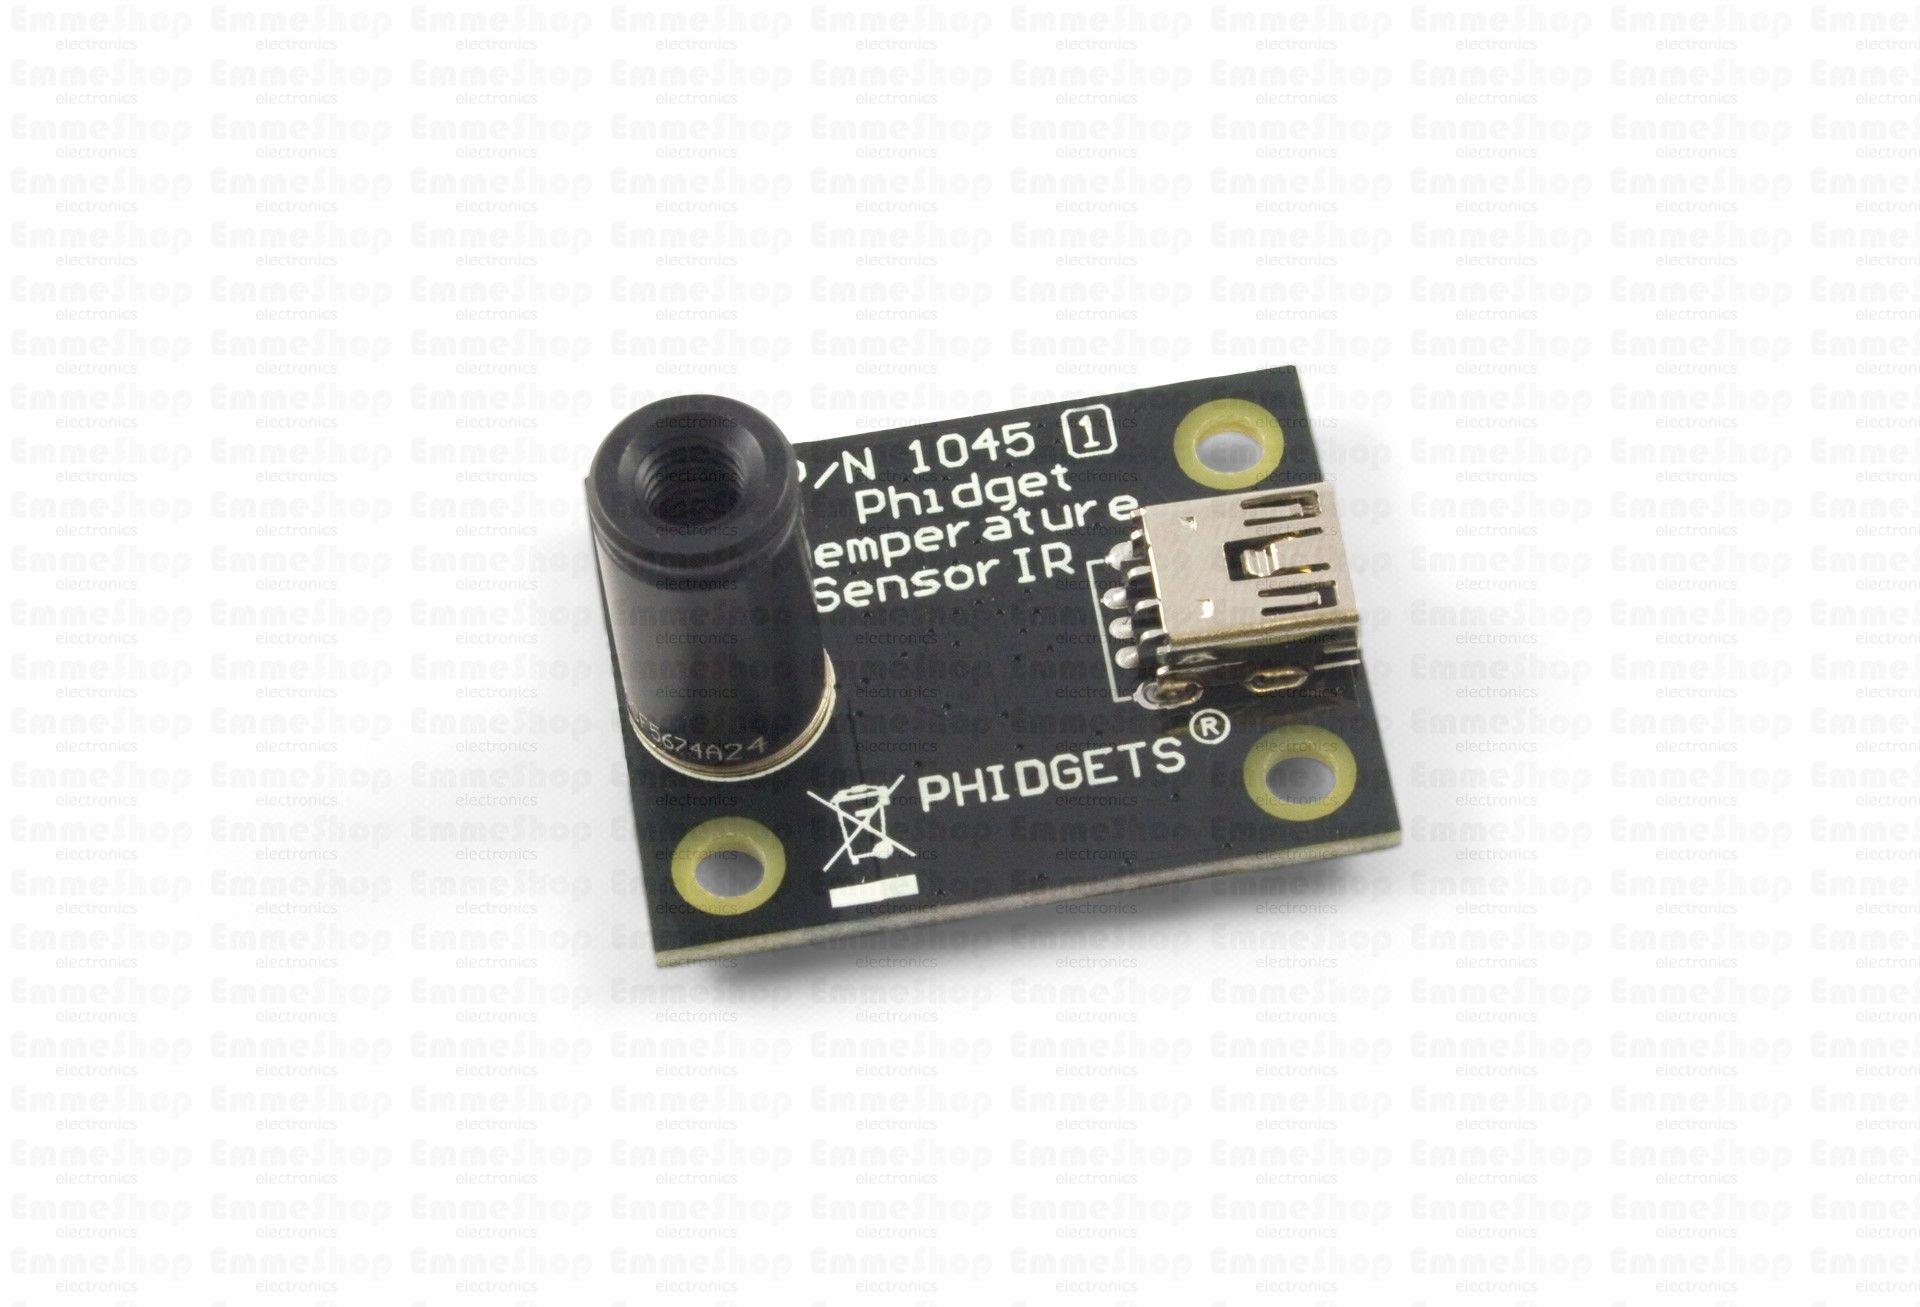 1045 1 Phidgettemperaturesensor Ir Measure The Temperature Of An